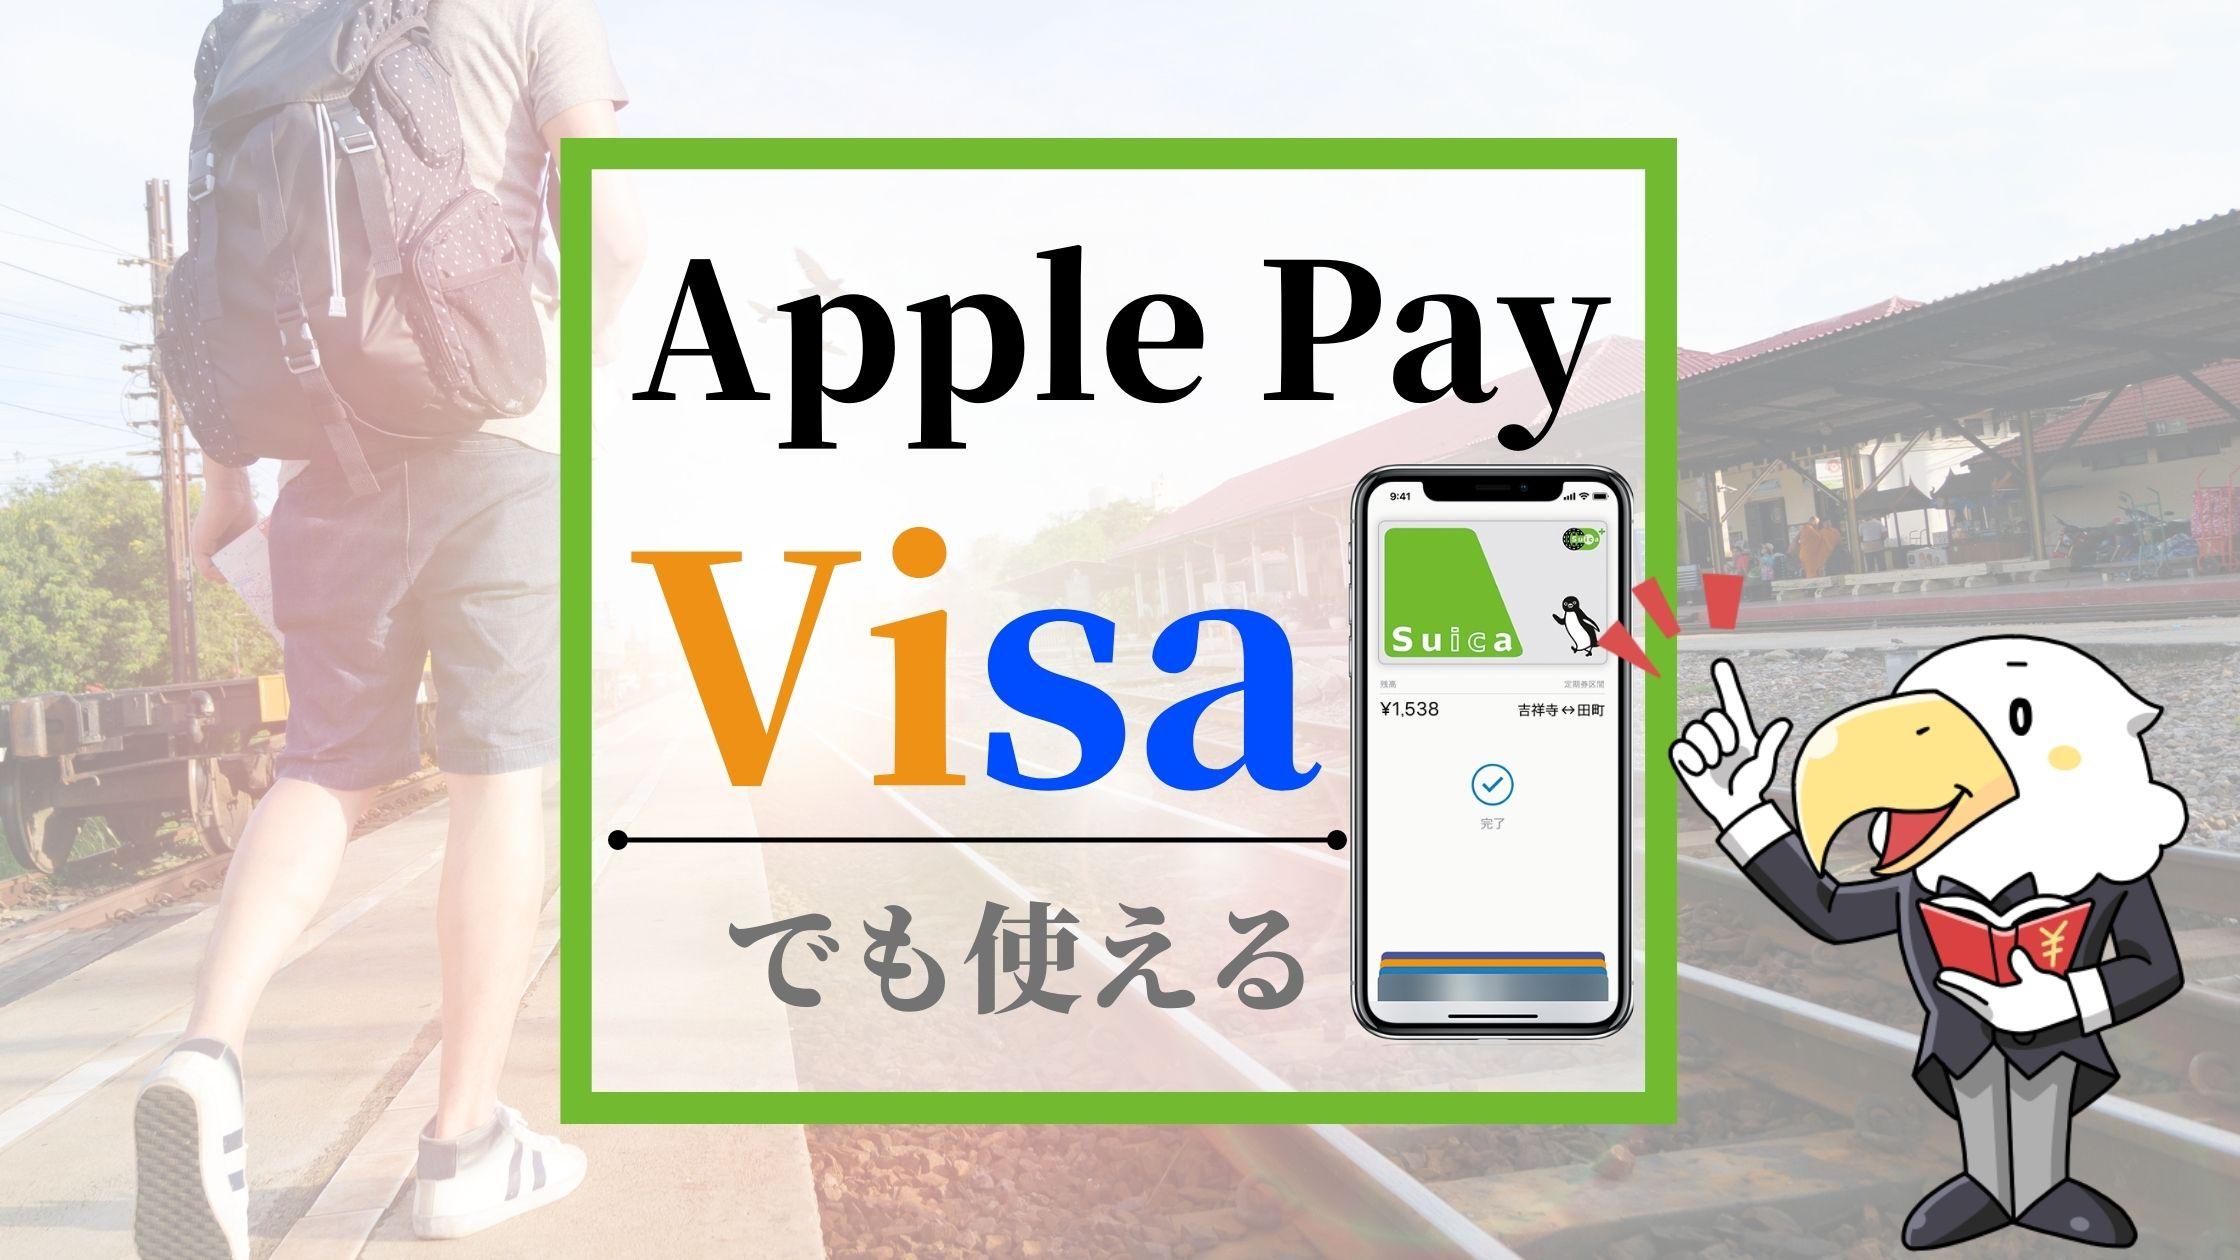 Visa Apple Pay icon